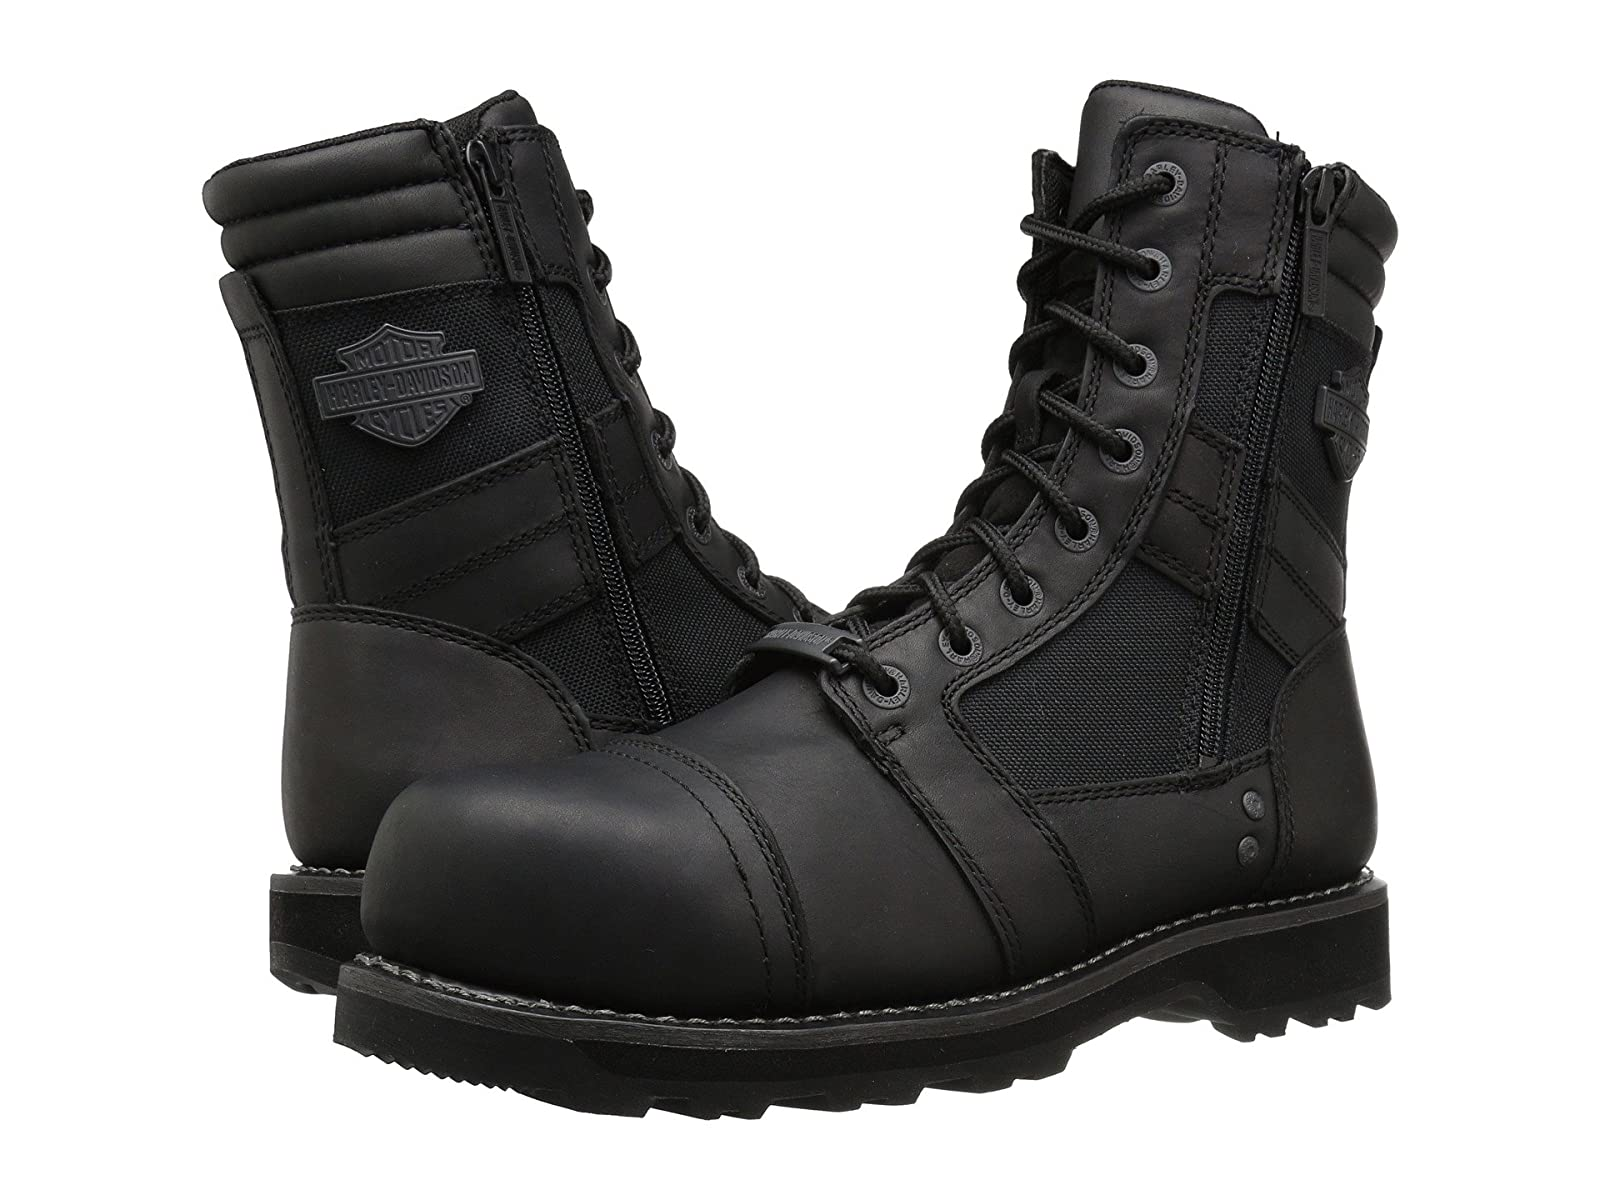 Harley-Davidson Boxbury Composite ToeAffordable and distinctive shoes